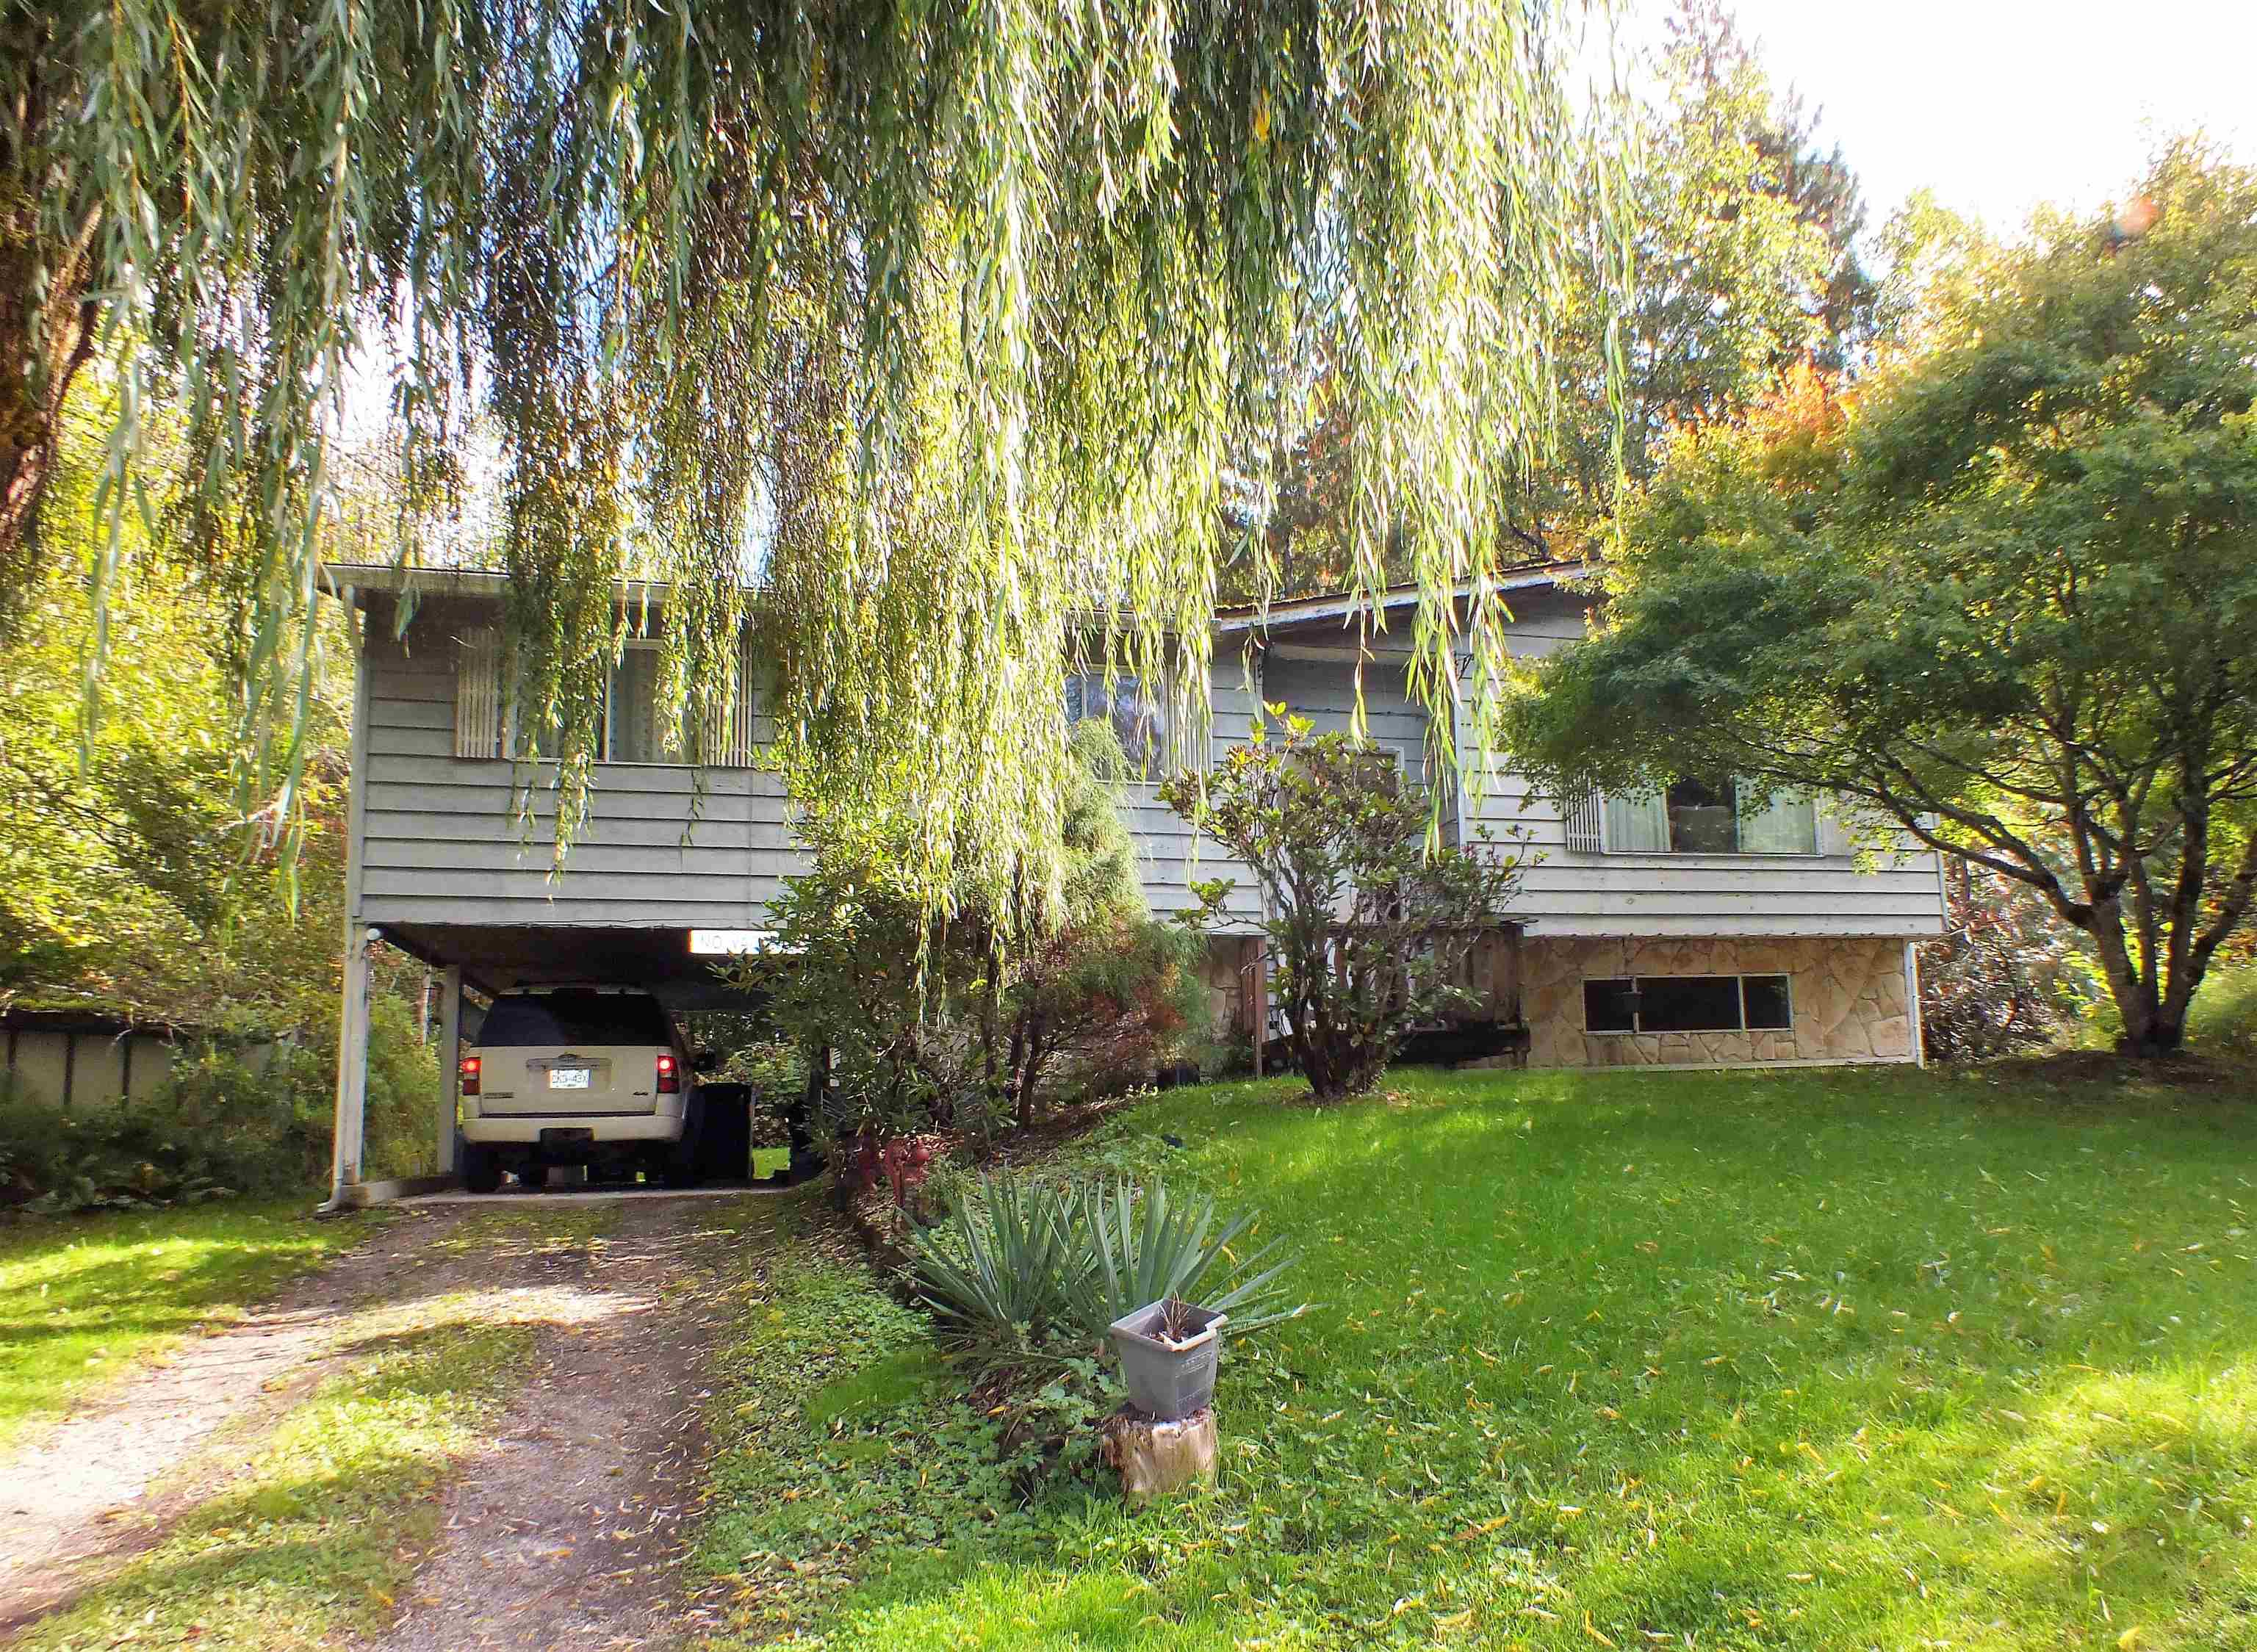 66686 KAWKAWA LAKE ROAD - Hope Kawkawa Lake House/Single Family for sale, 4 Bedrooms (R2626104) - #1